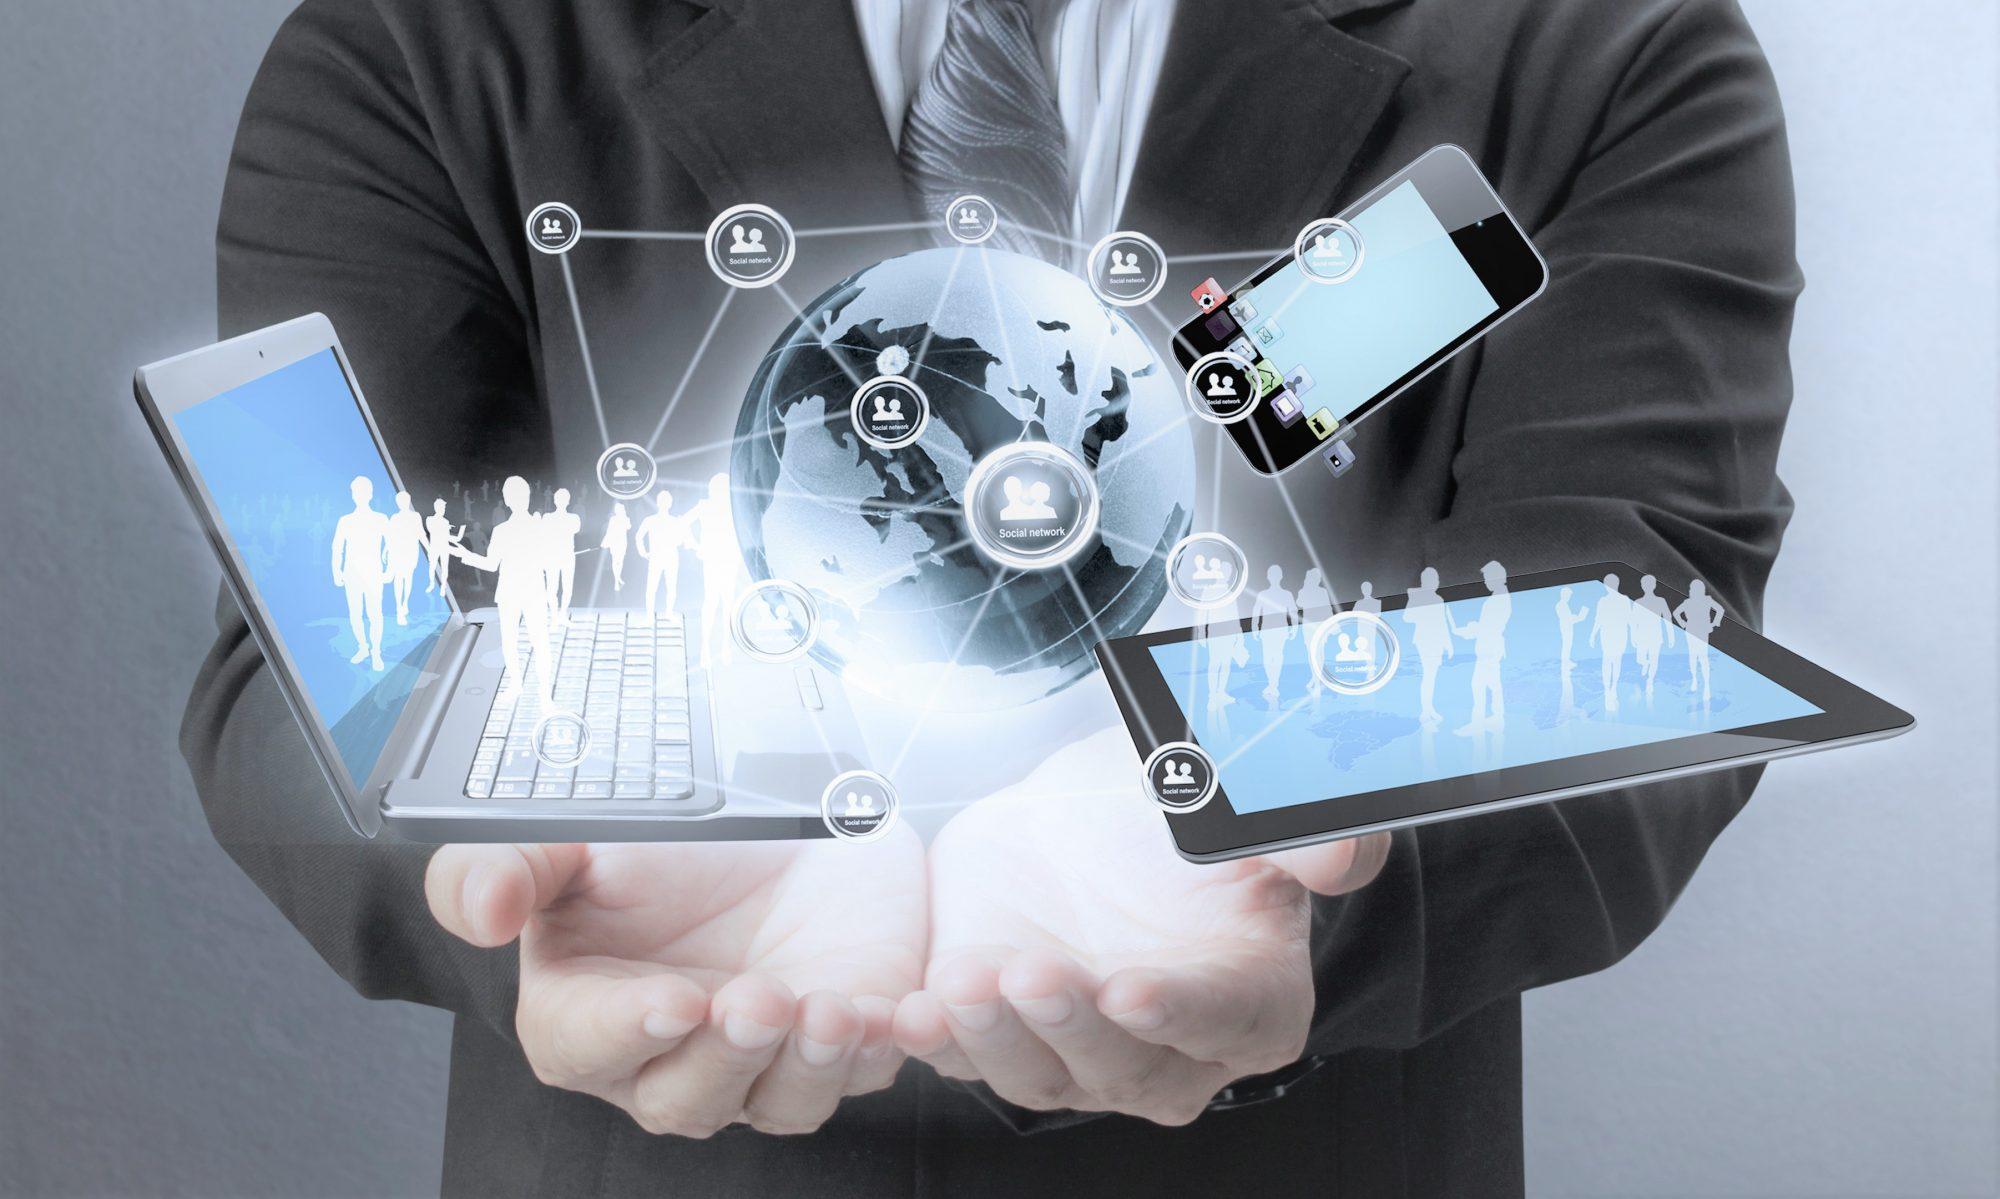 PCH IT Solution GmbH